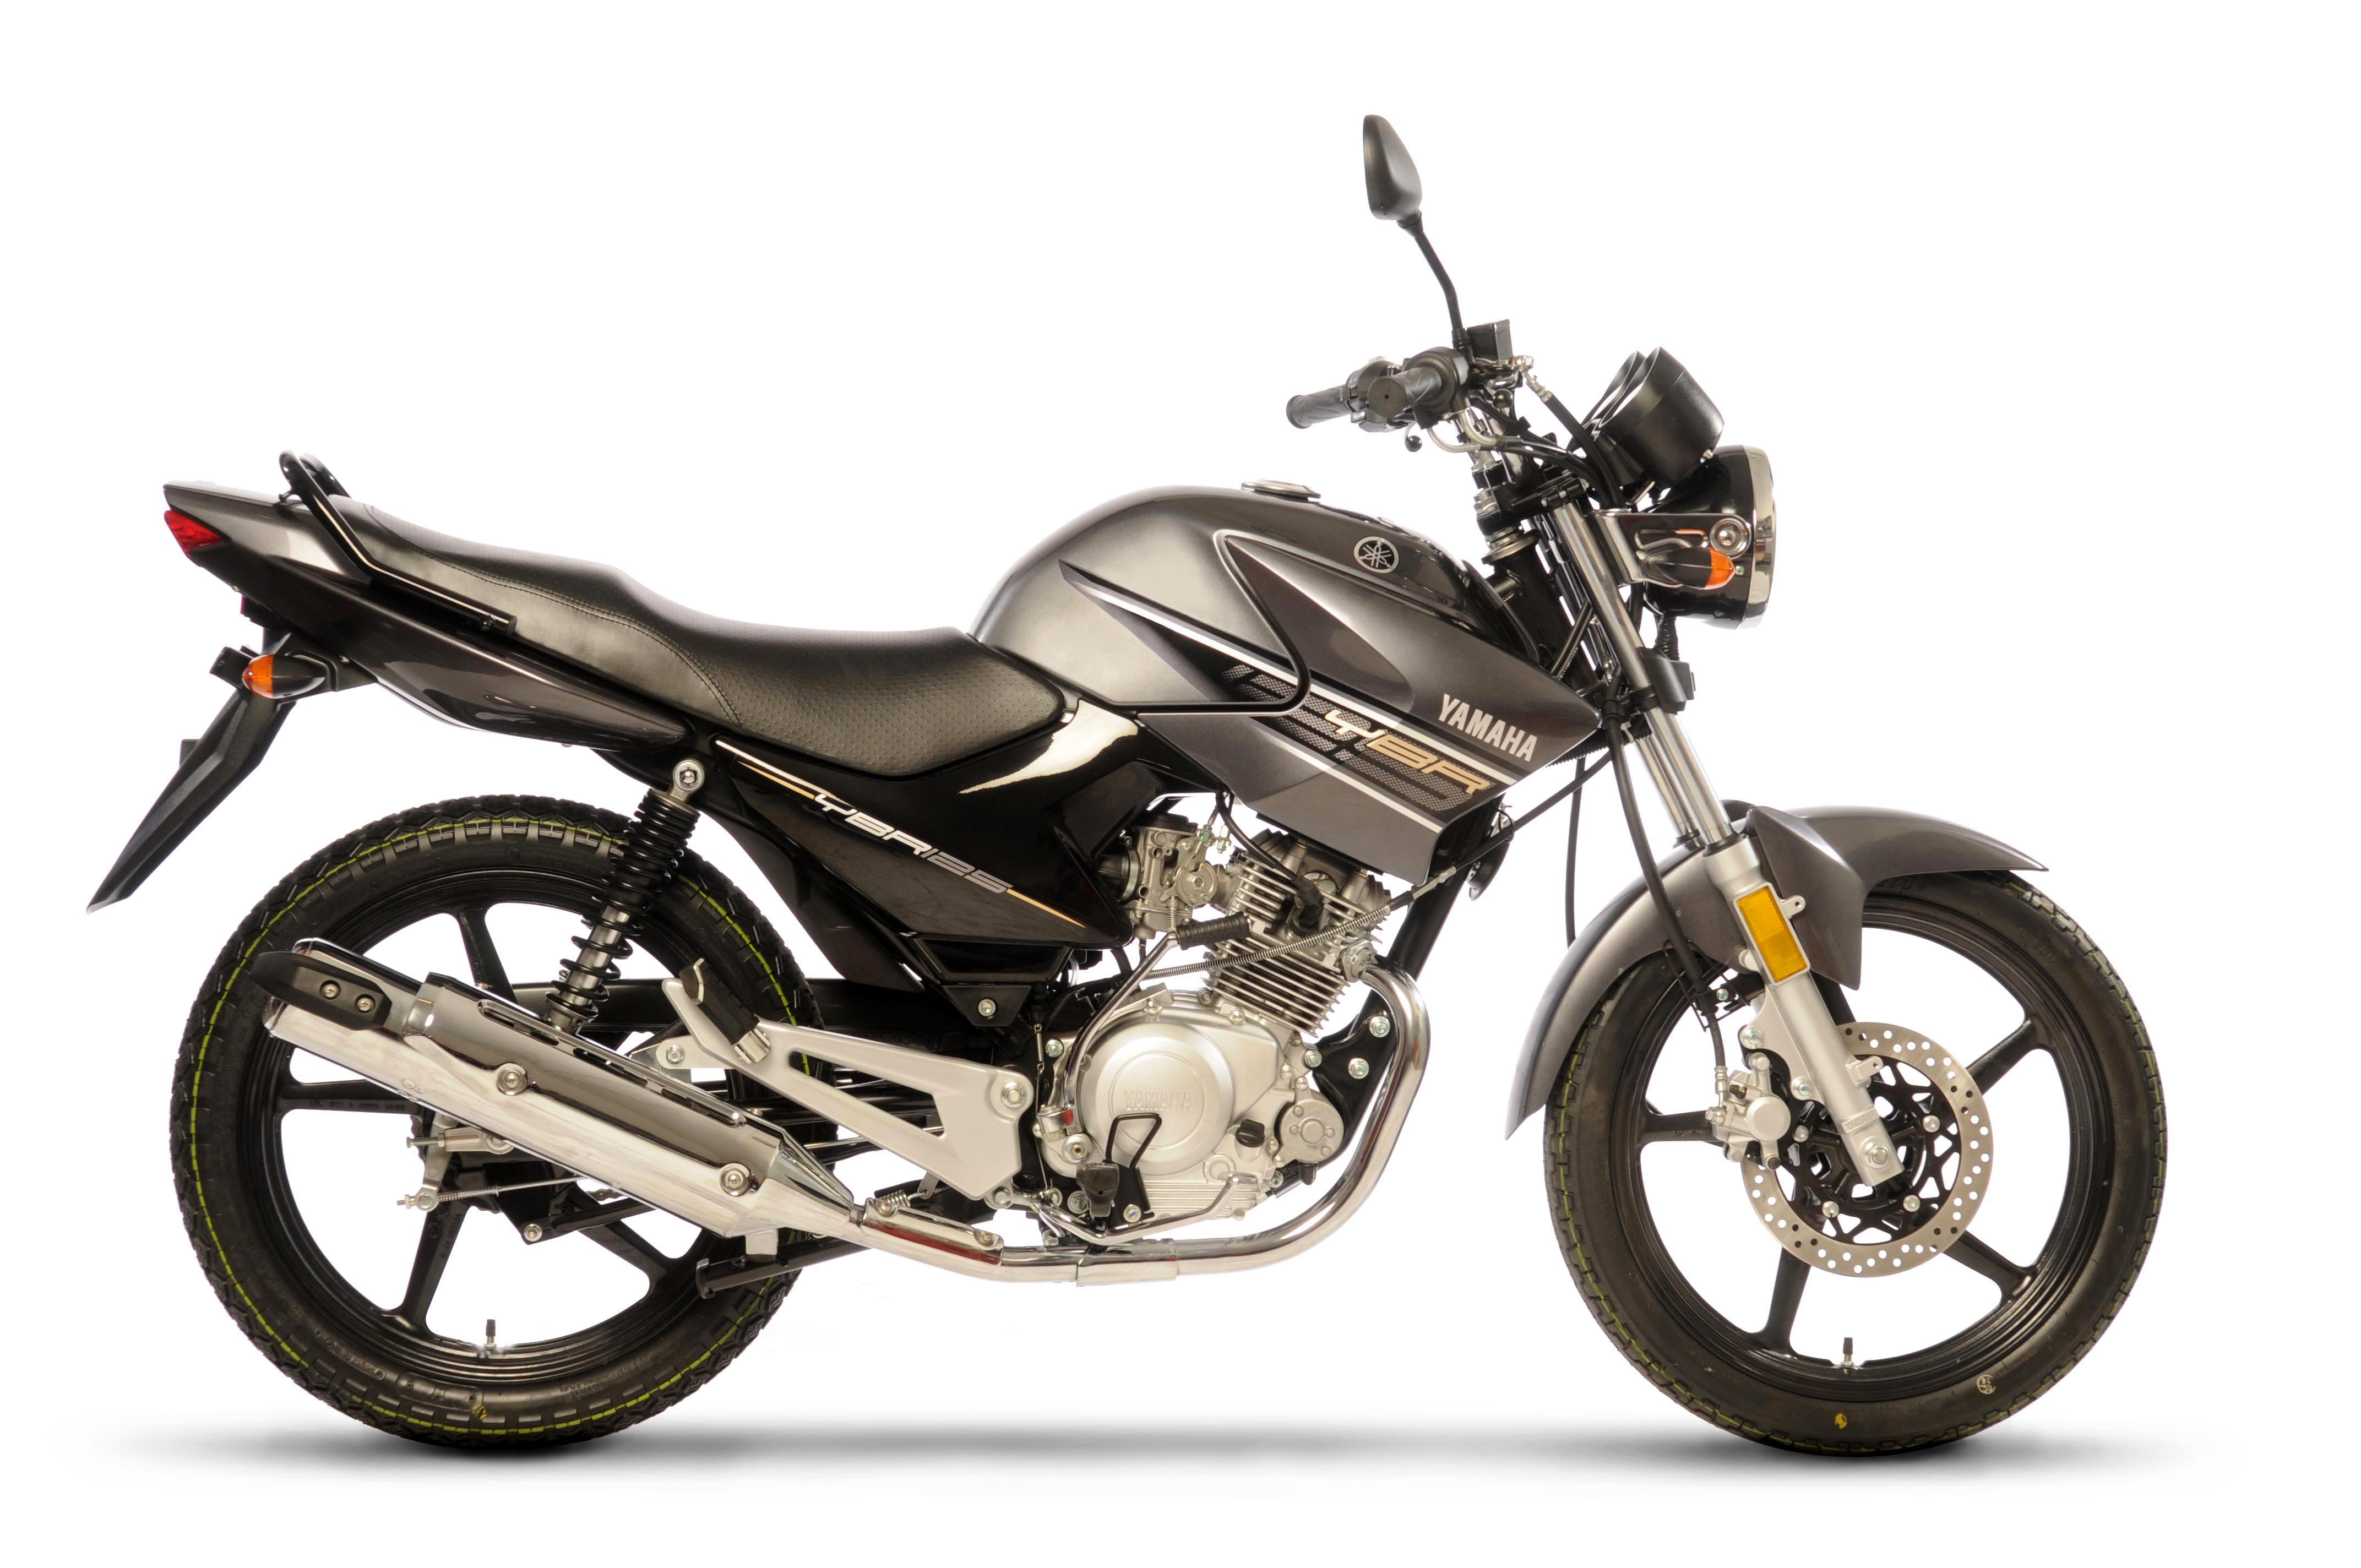 мотоцикл yamaha ybr 125 новый